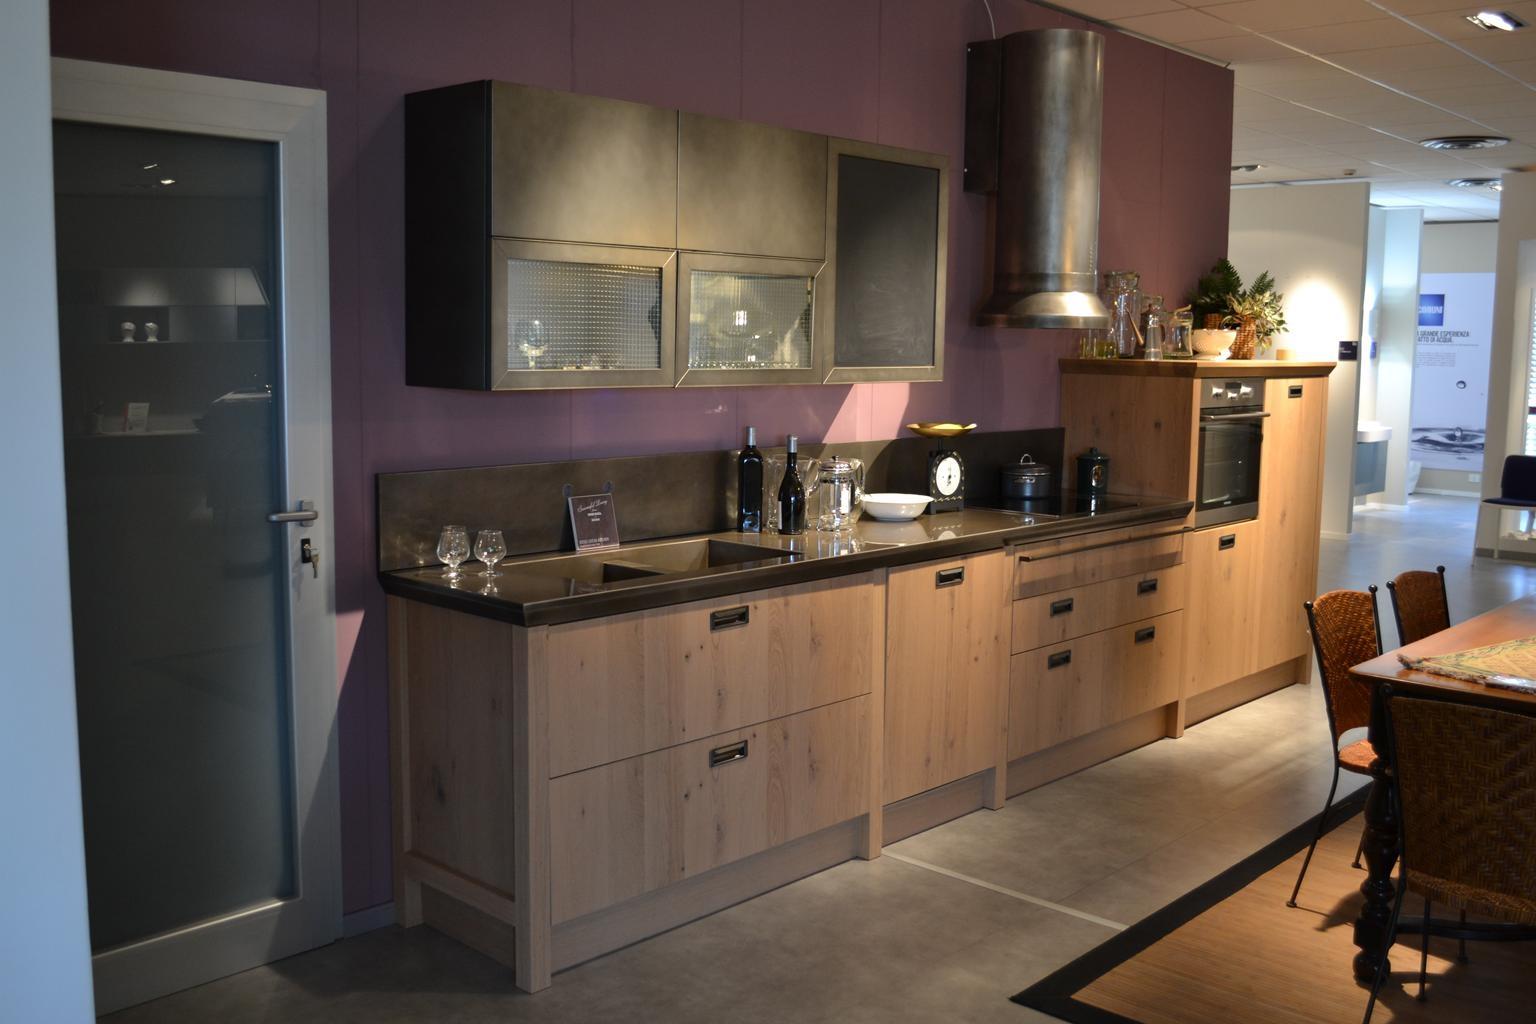 Cucina scavolini diesel cucine a prezzi scontati - Cucine scavolini prezzi ...